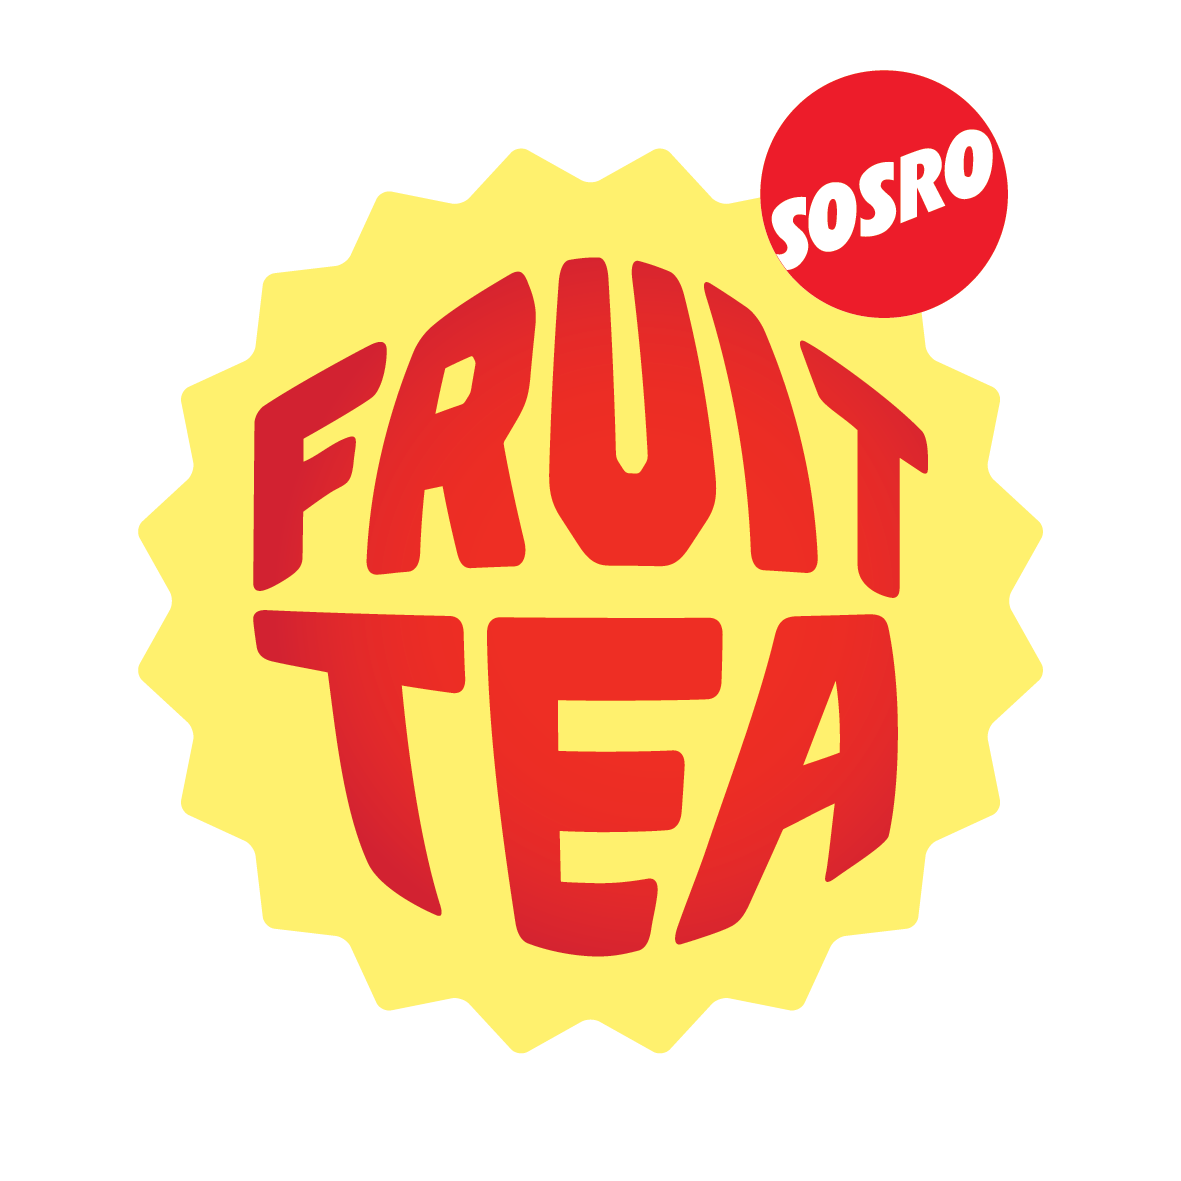 #fruitteasosro #fruitteawtf19 #tebarsensasi #banyaksensasinya